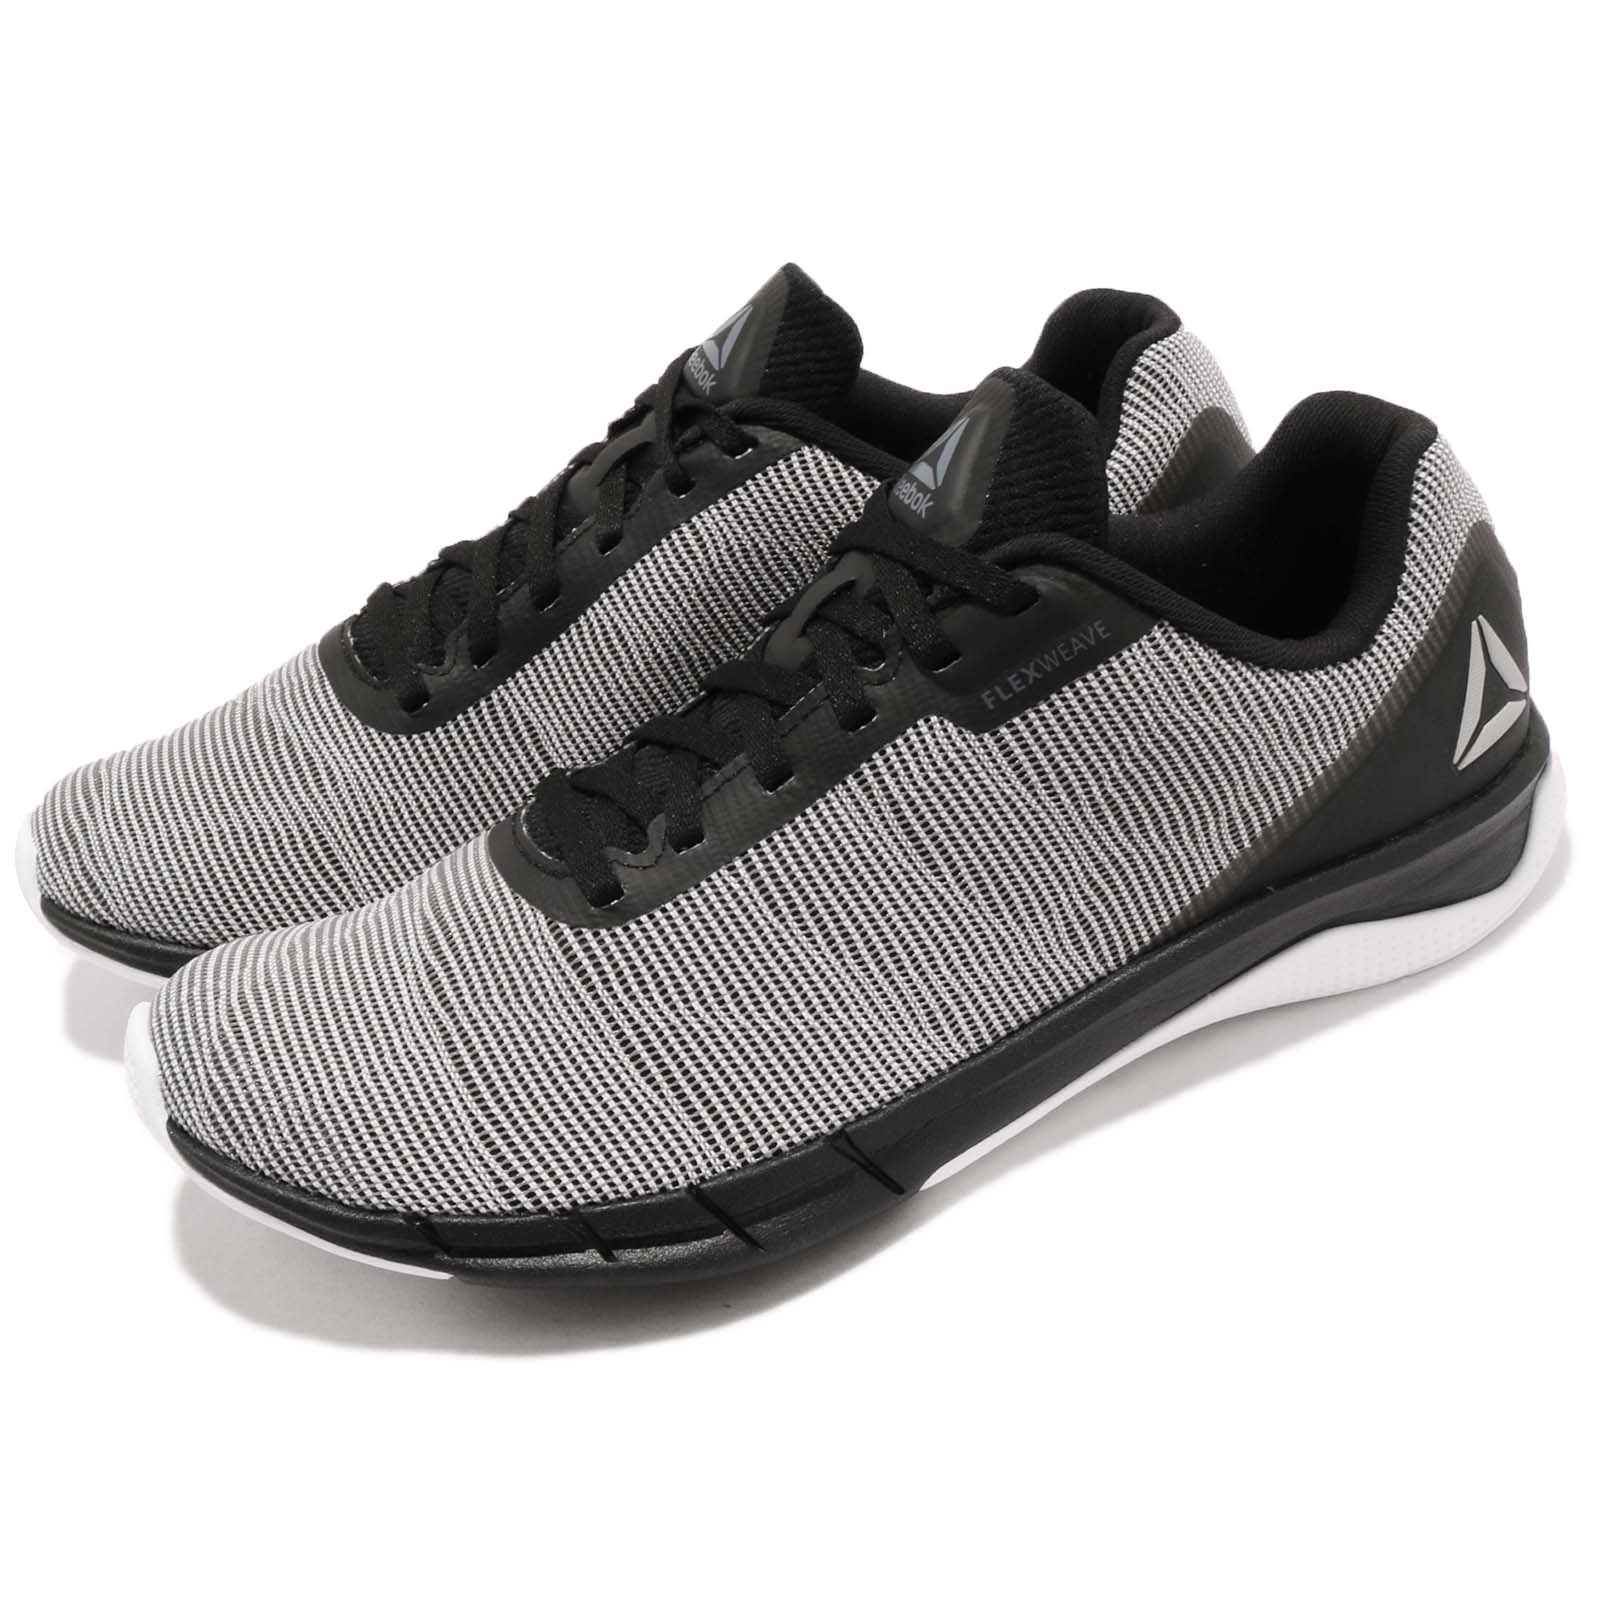 Reebok 慢跑鞋 Fast Flexweave 男鞋 CN5097